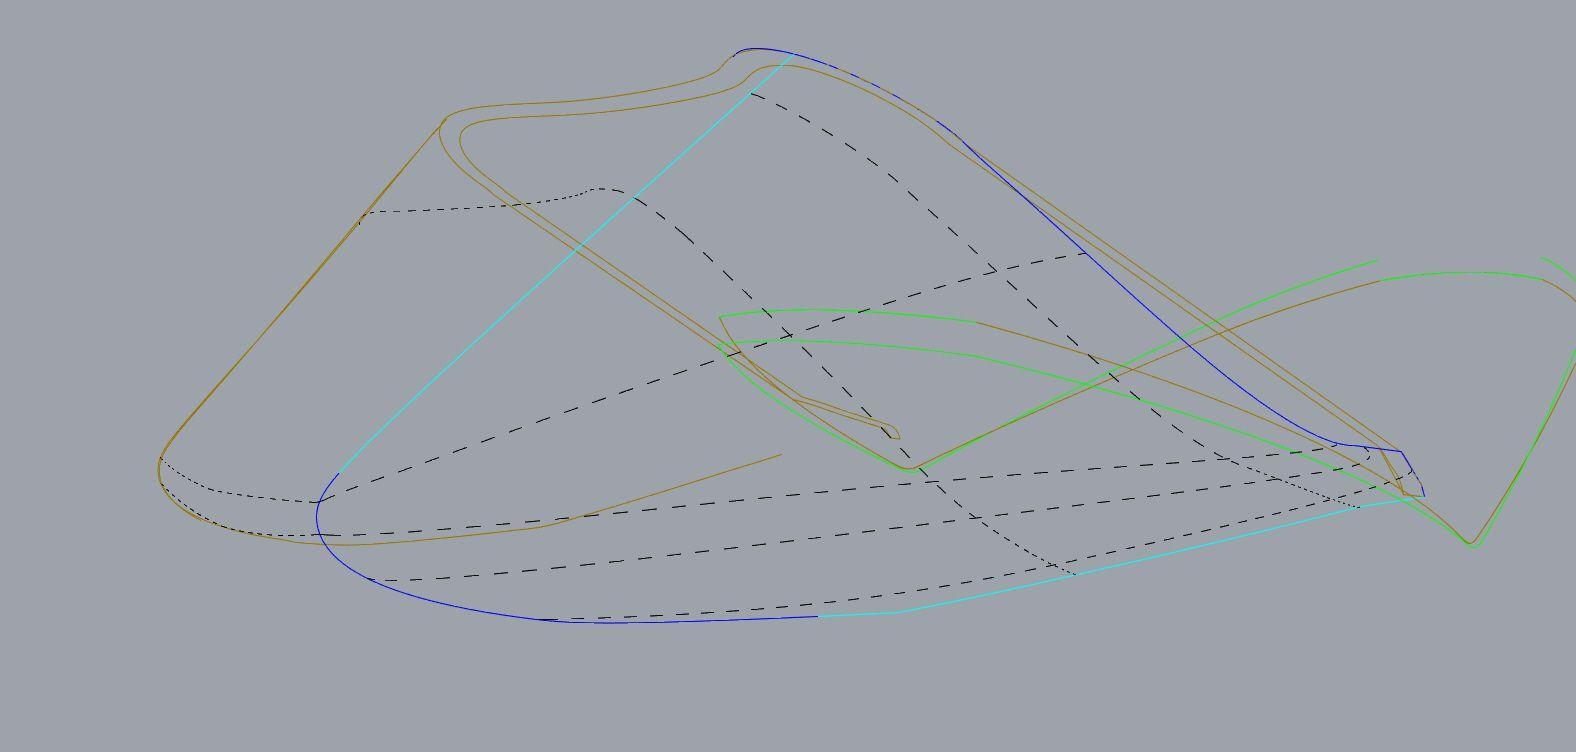 curve1_compressed.jpg.4cec43ce270b6ebd18147c78545be0ae.jpg